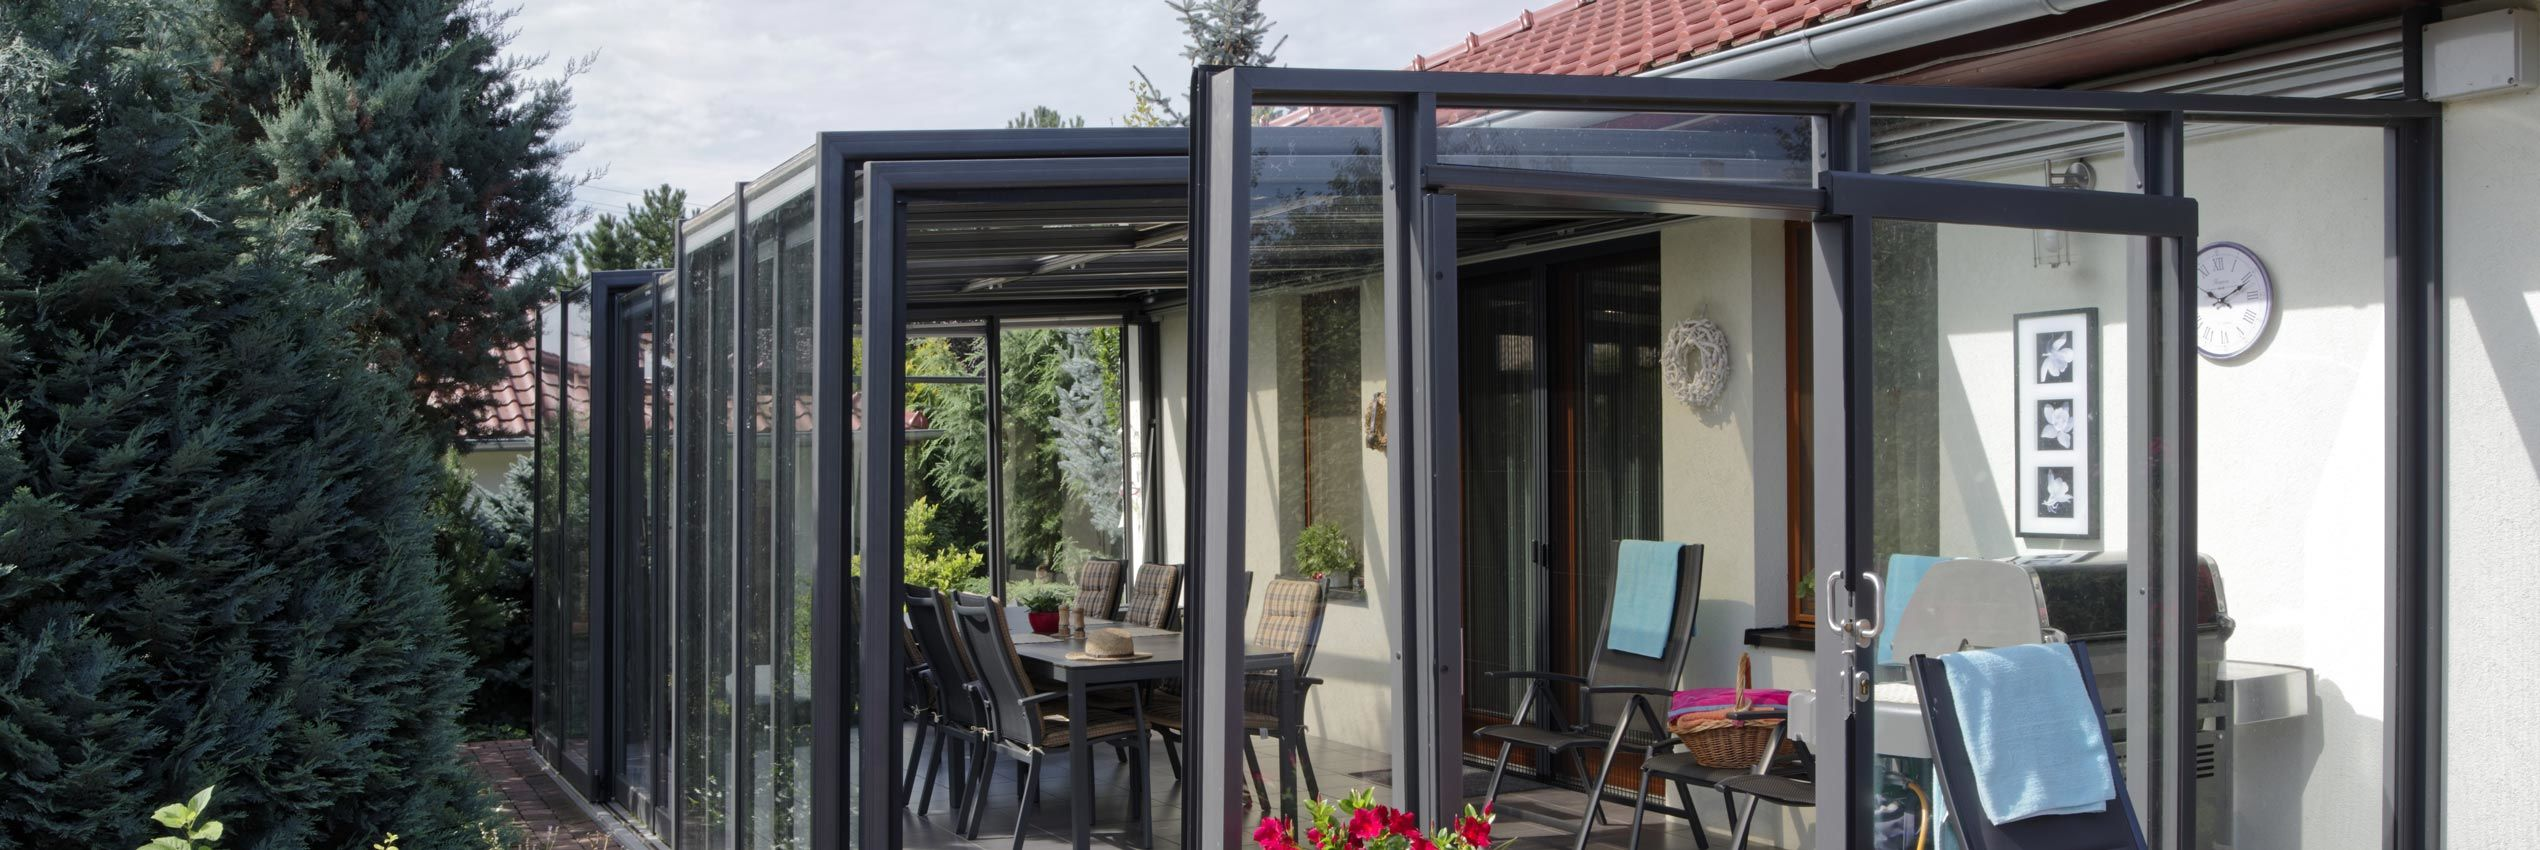 Terrassenüberdachung CORSO Glass